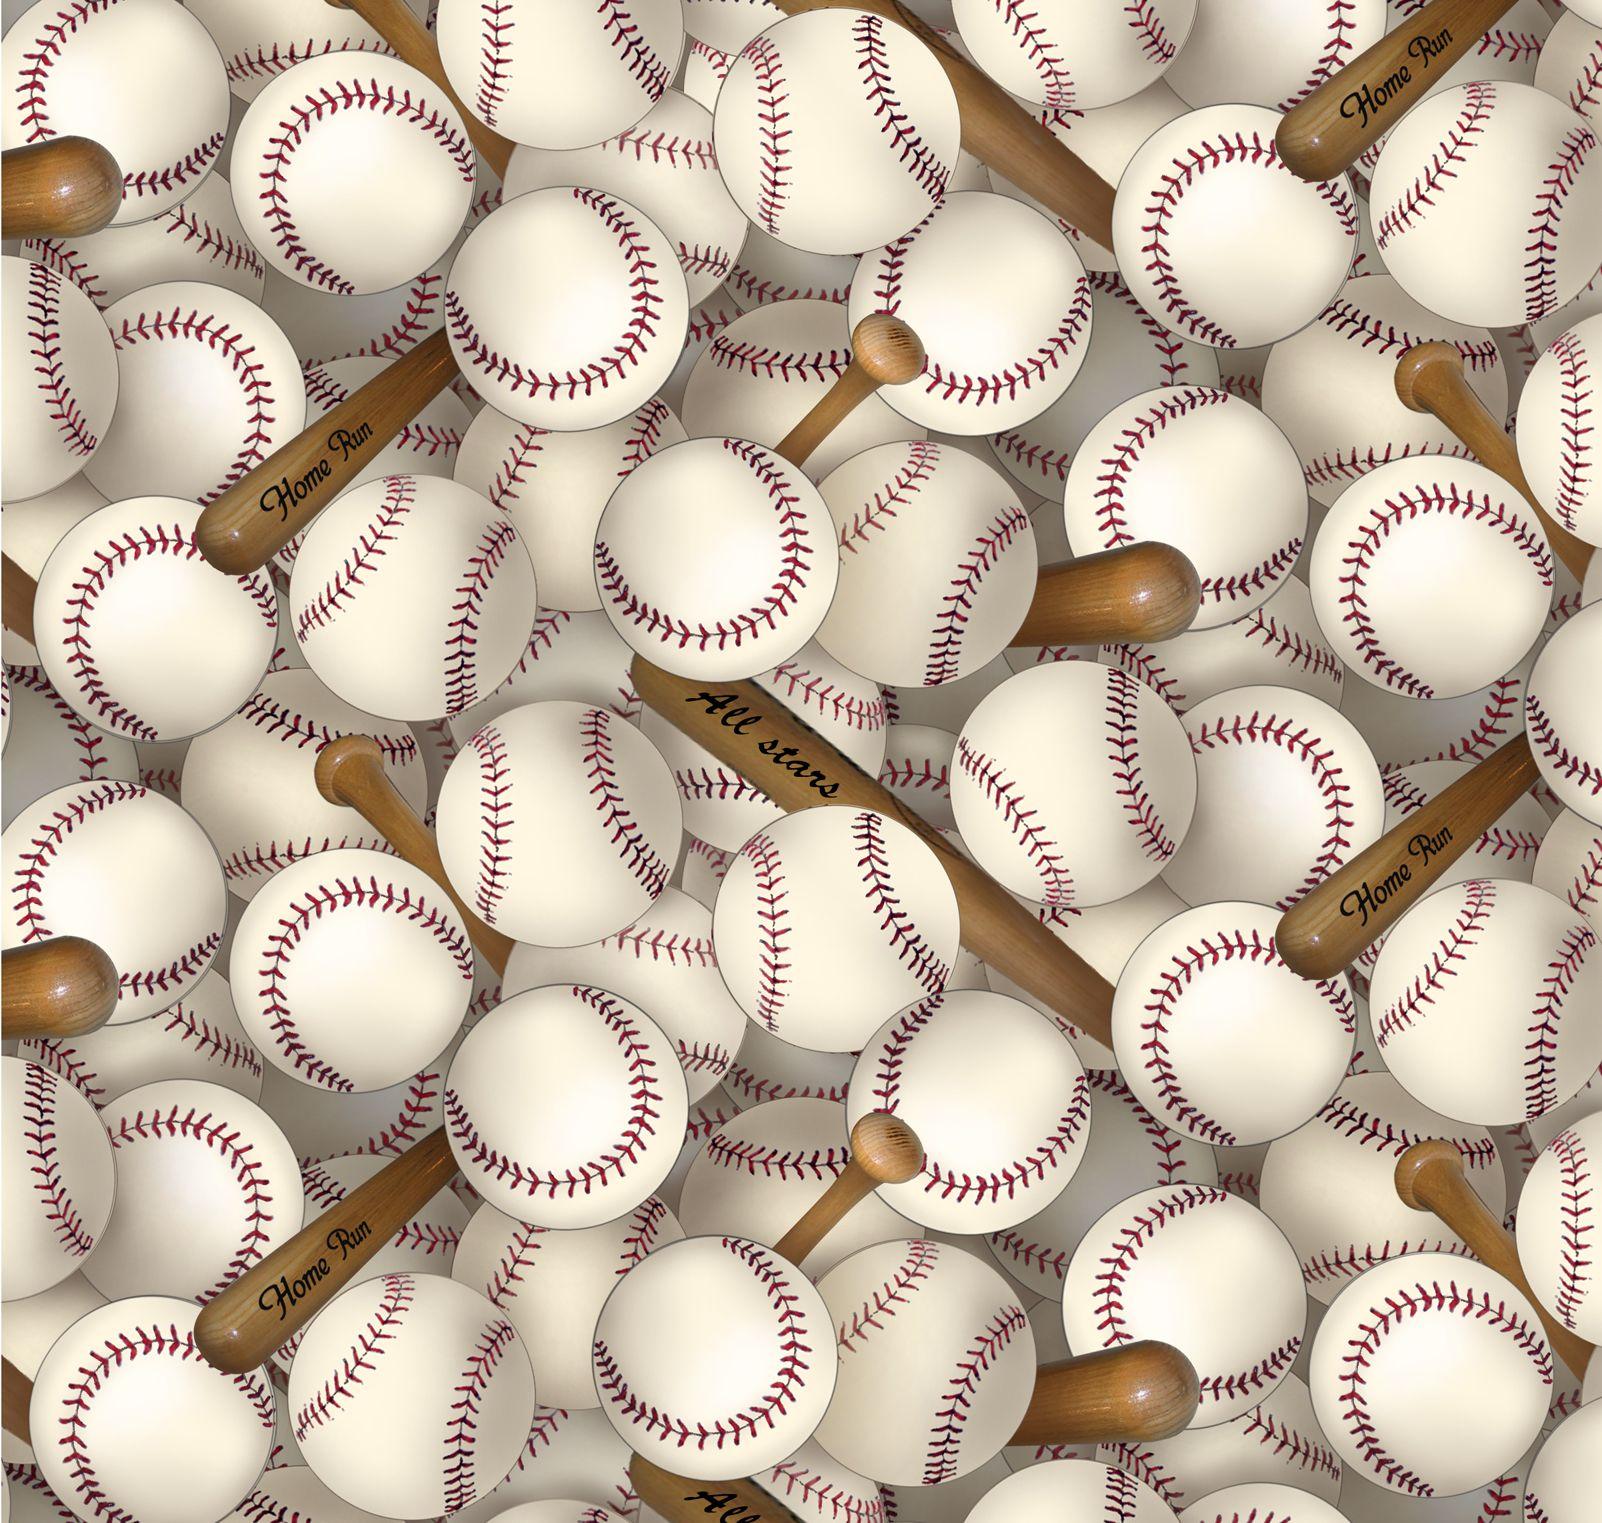 $11.00 baseball fabric   Sports Fabric   Pinterest   Sports ... : baseball fabric for quilting - Adamdwight.com